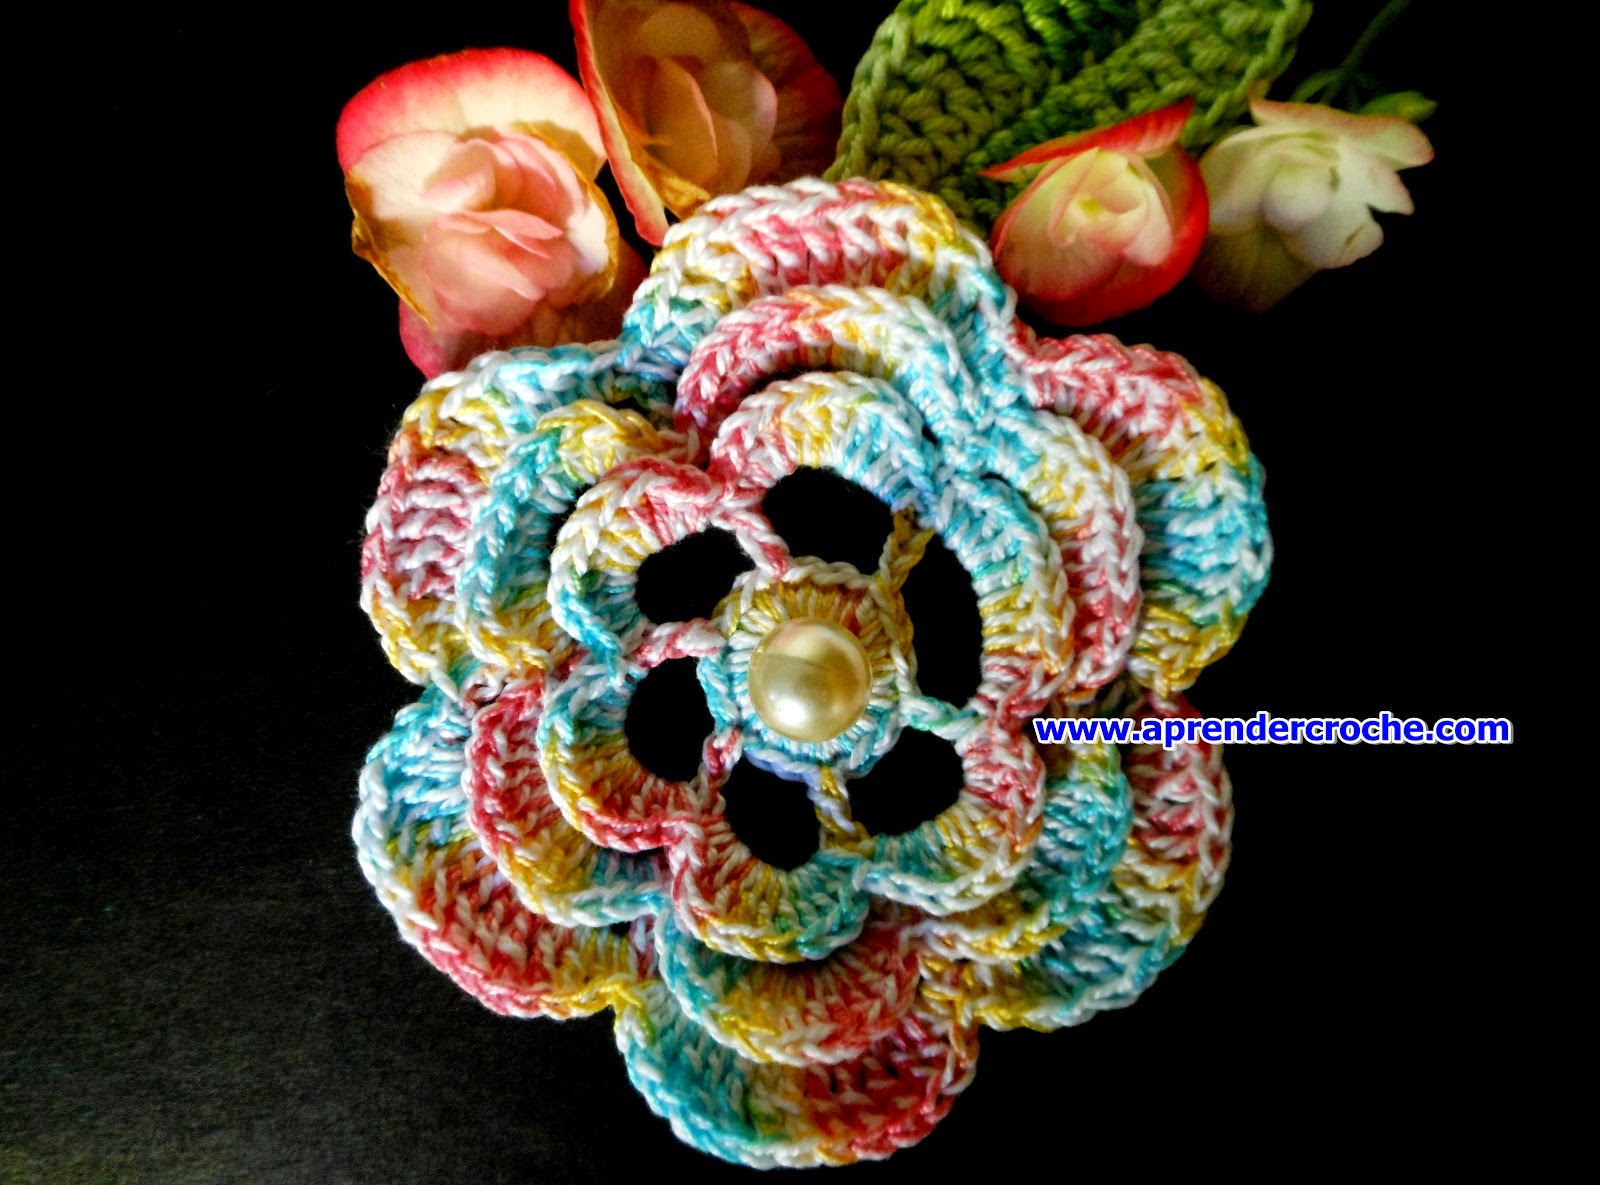 aprender croche flores folhas dvd loja curso de croche frete gratis edinir-croche